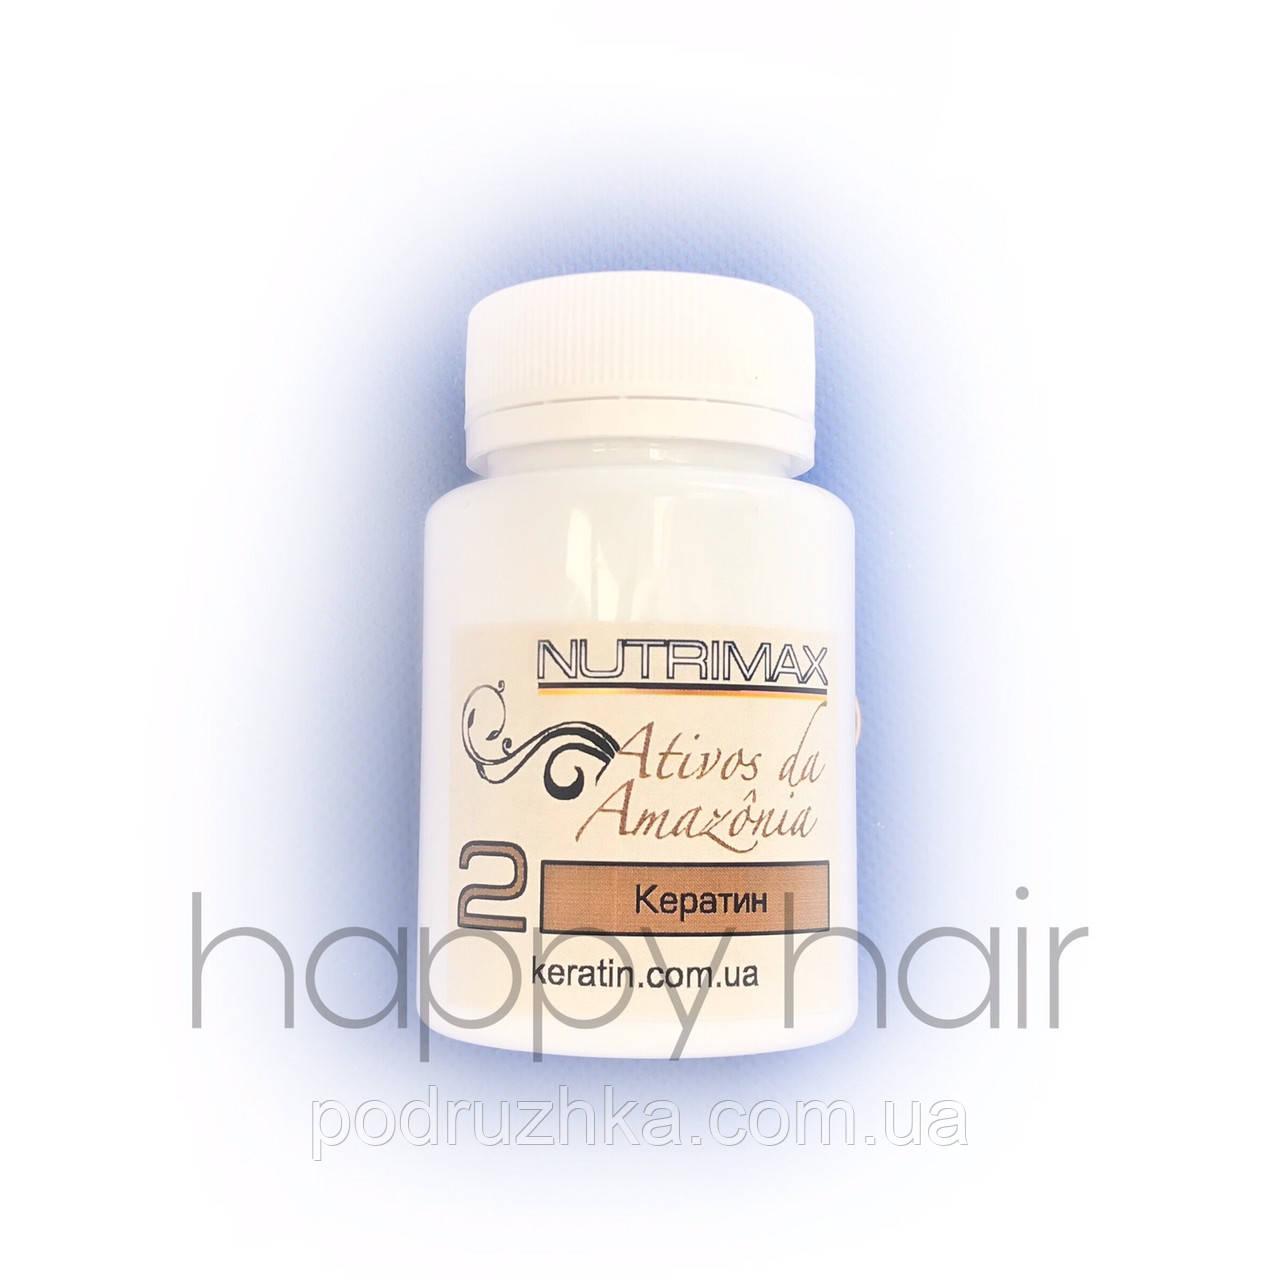 Кератин для волос Nutrimax Soller (шаг 2) 100 г